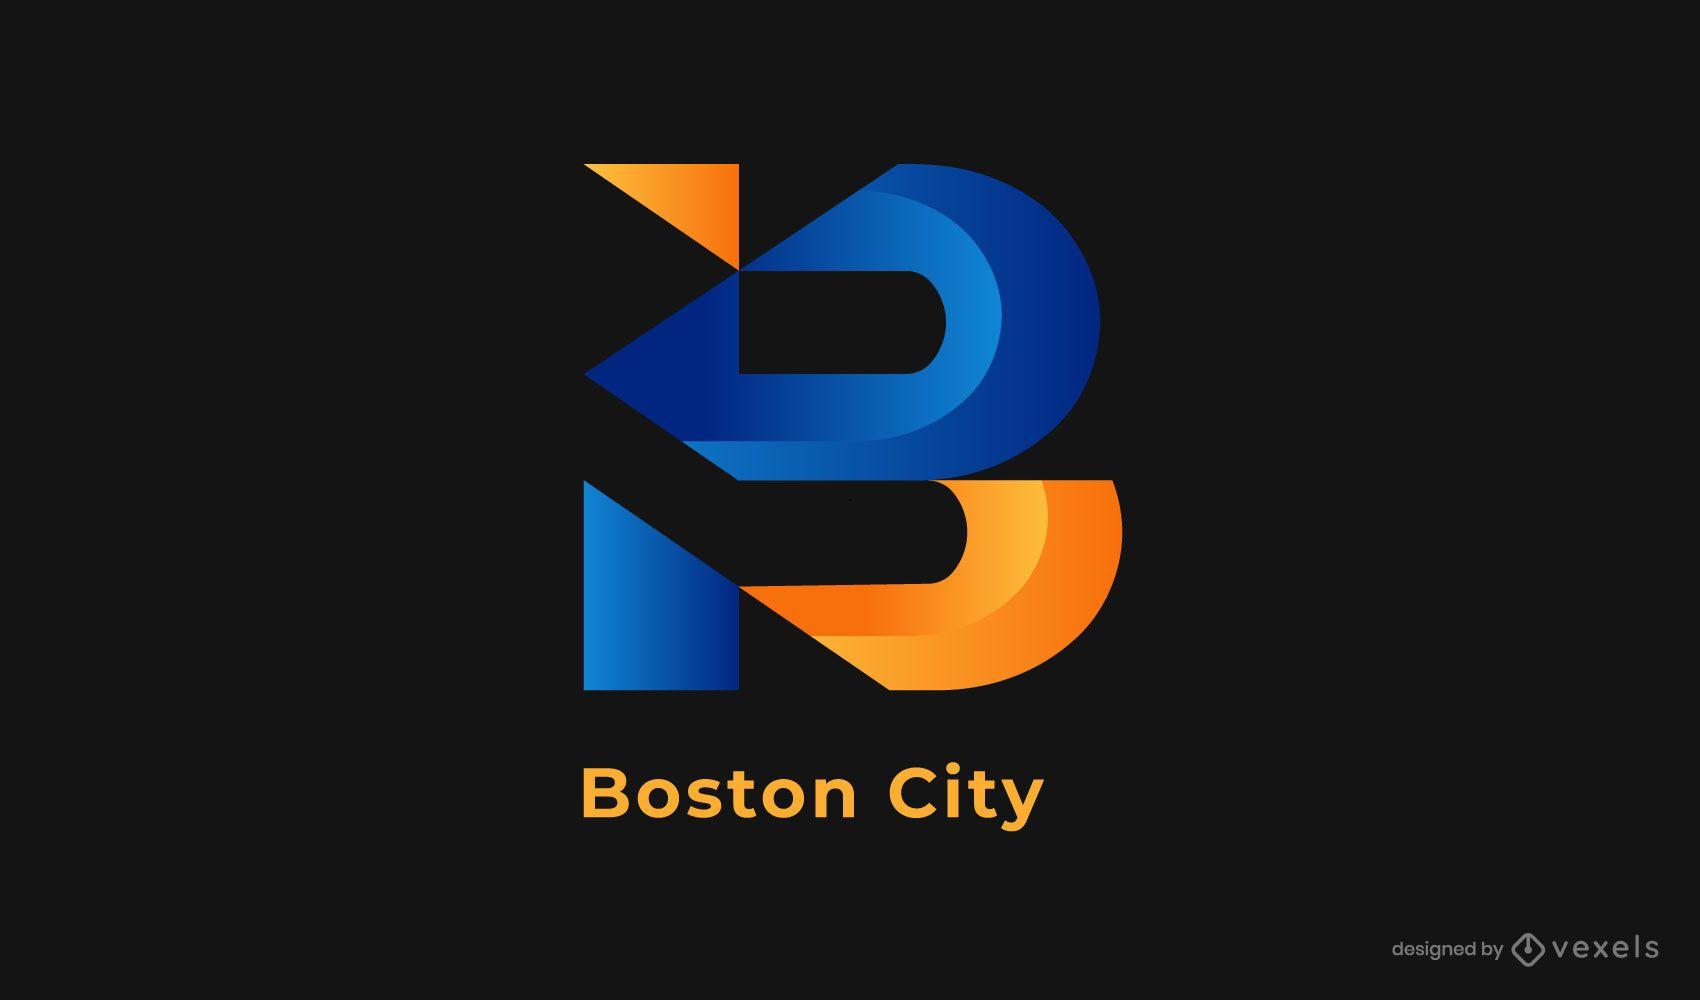 boston city logo design